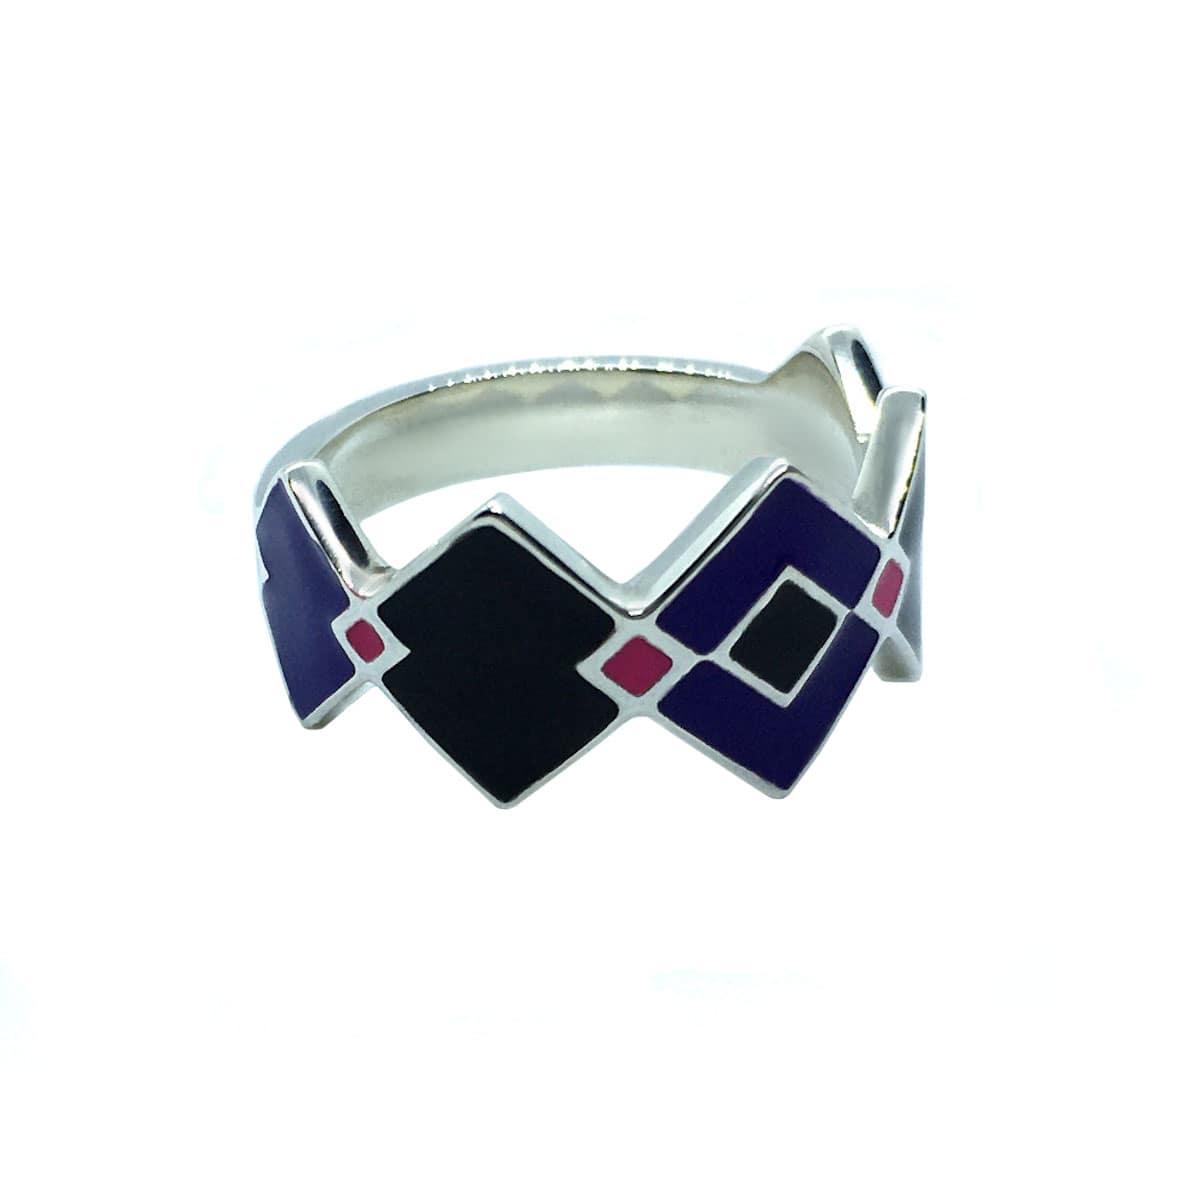 Bili Silver Squares Enamel Ring